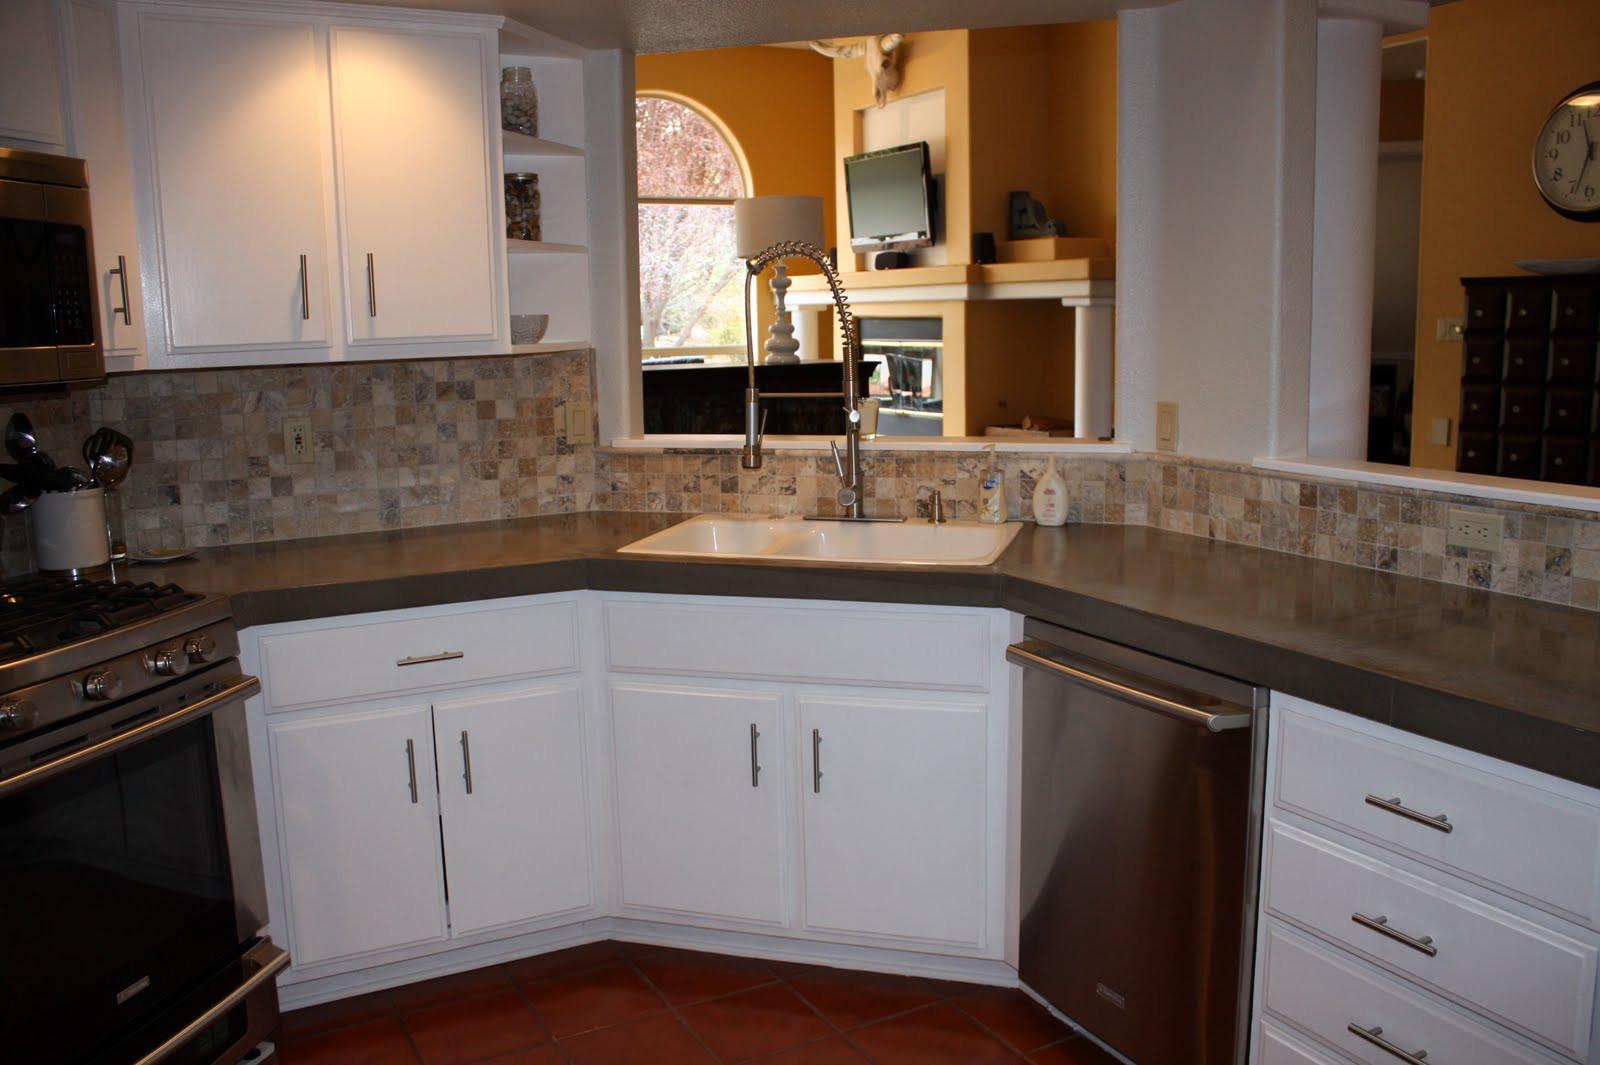 Kitchen Concrete Countertop  Quick Install of Concrete Countertops Kitchen Remodel